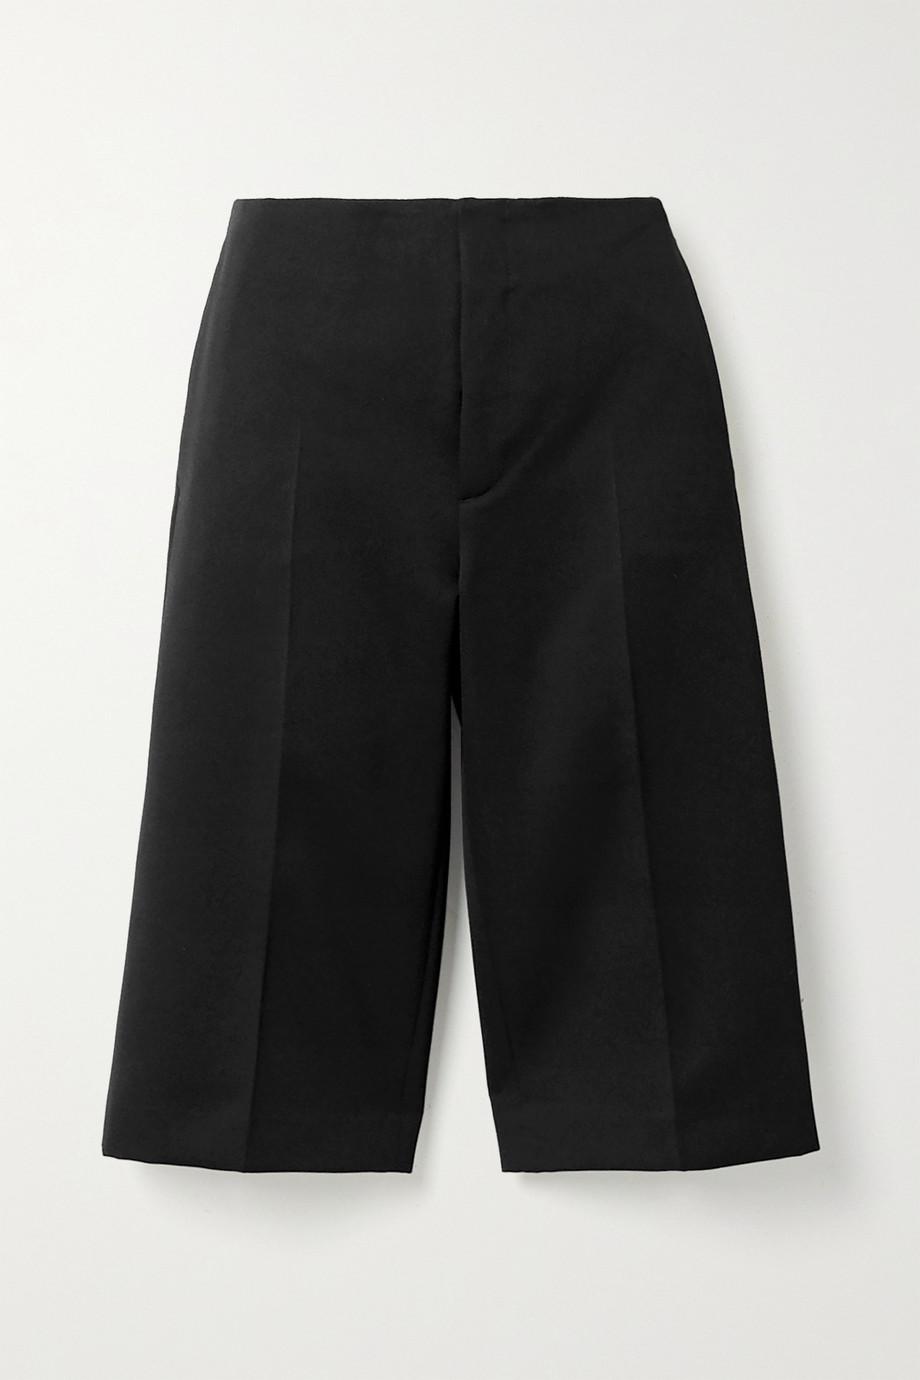 Maison Margiela 梭织短裤